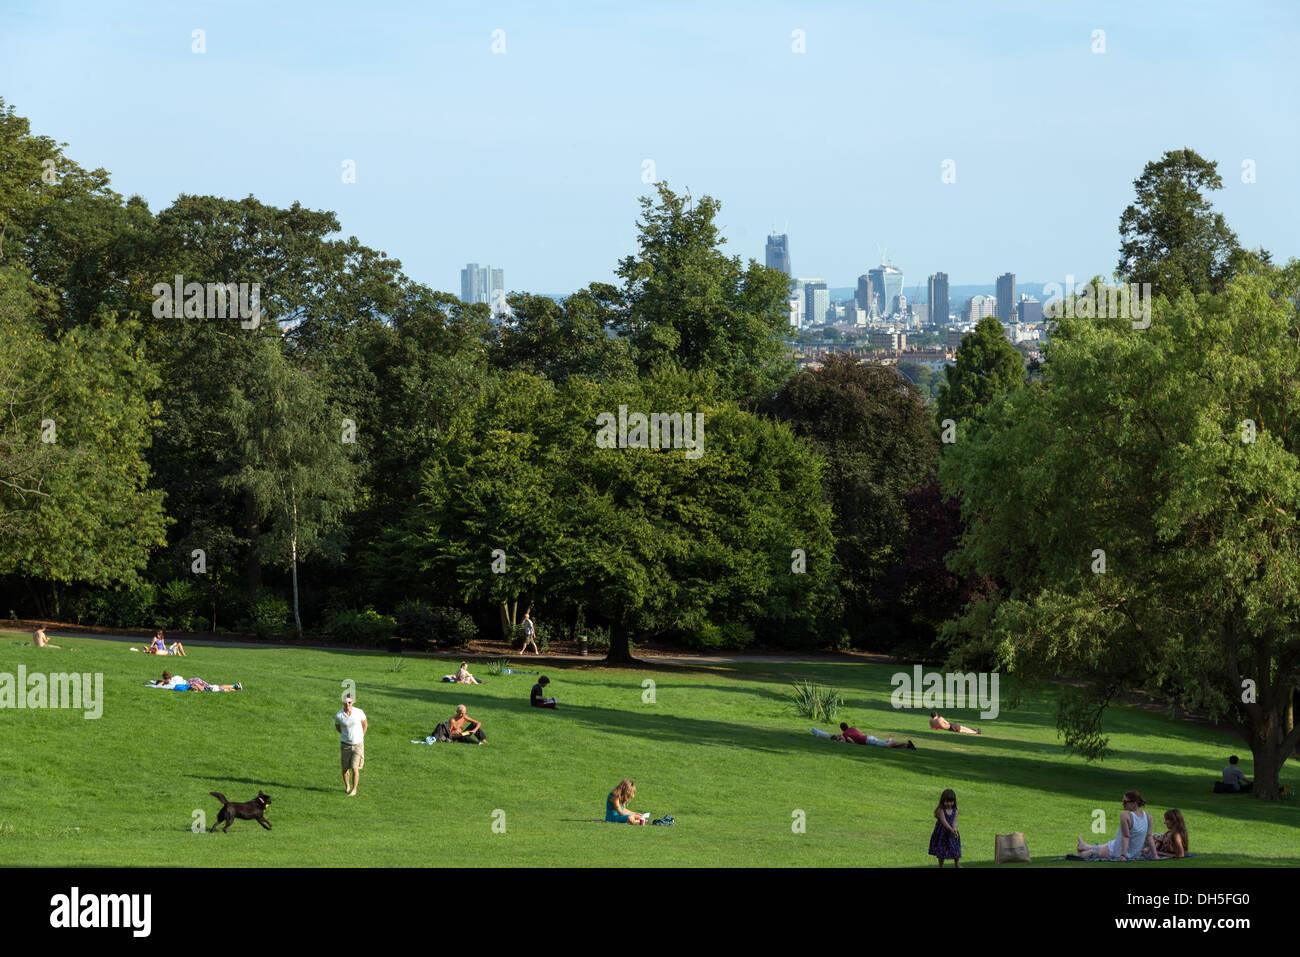 Waterlow Park, Highgate Village, London, England, UK Stock Photo